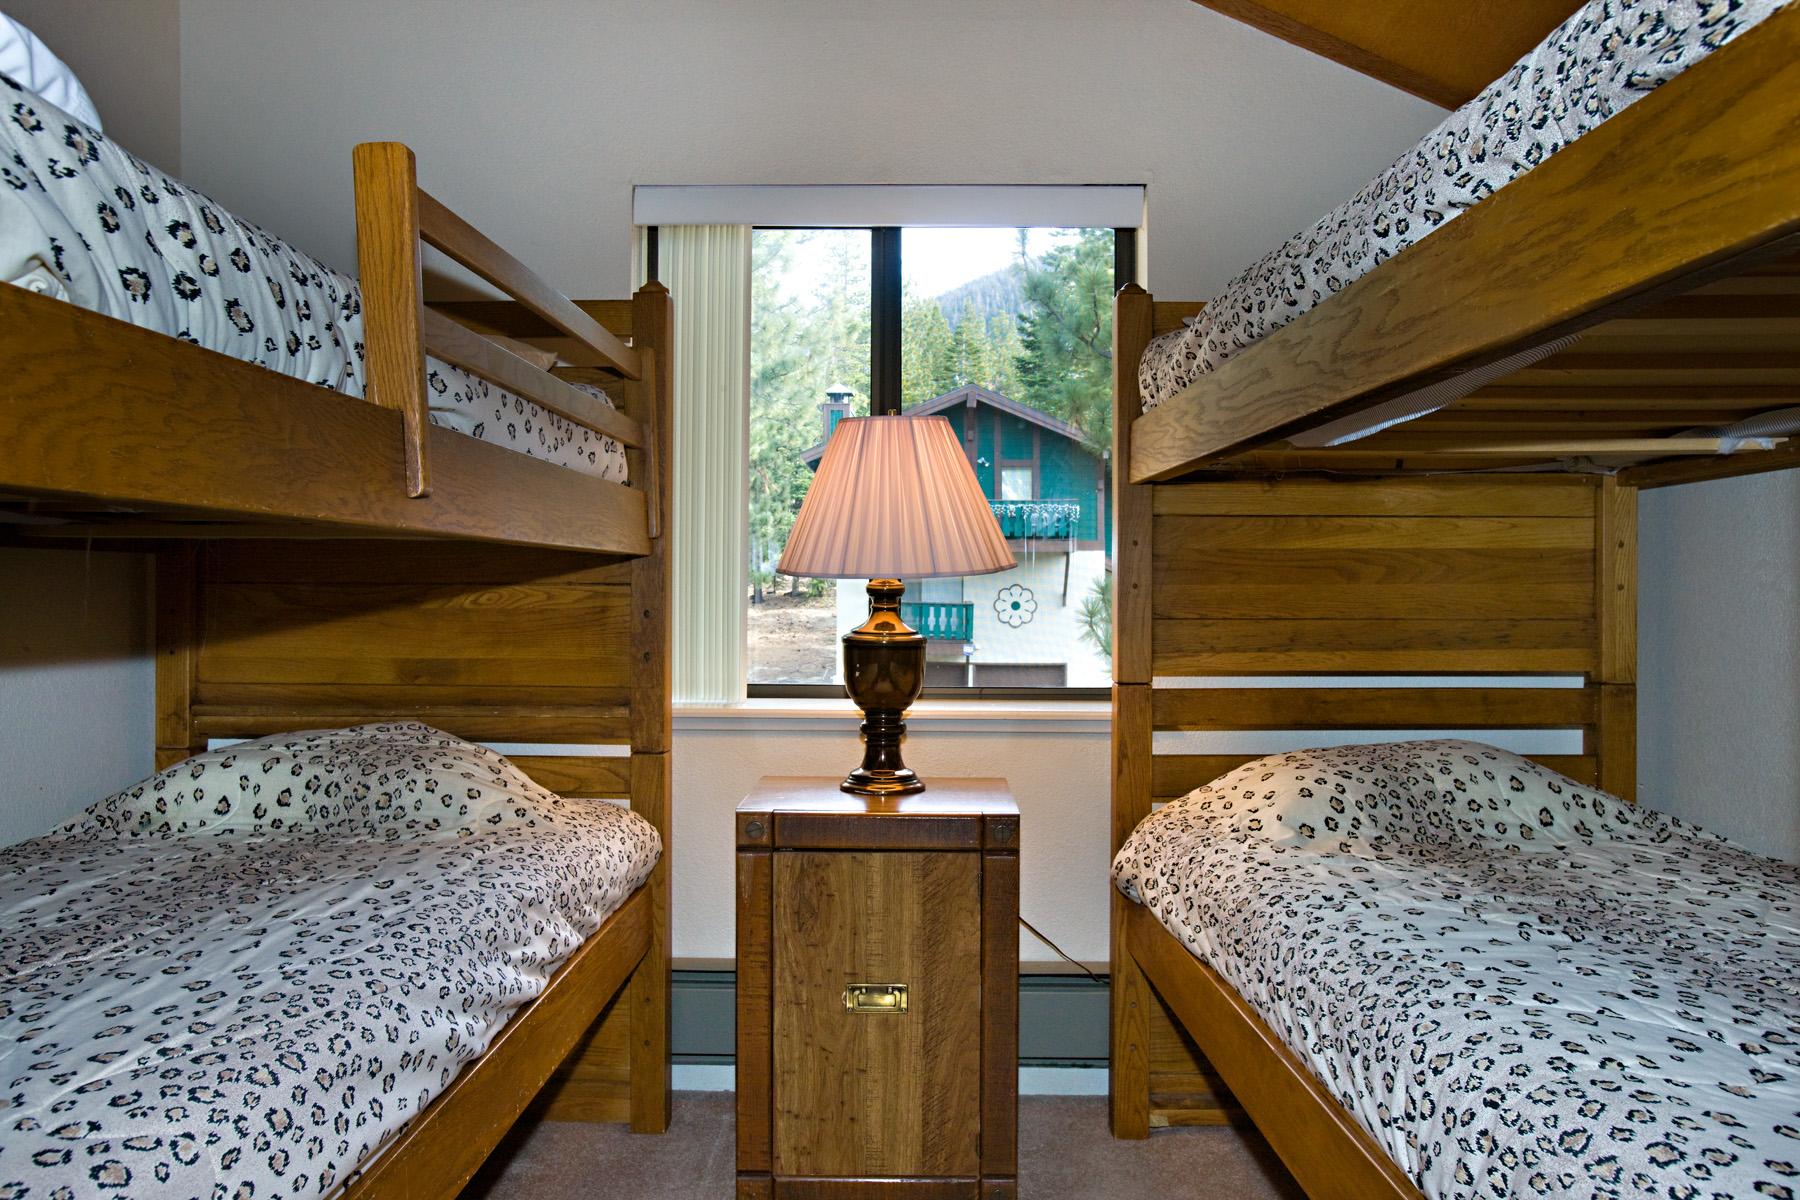 Tahoe, Tahoe Tyrol 1240, upstairs loft